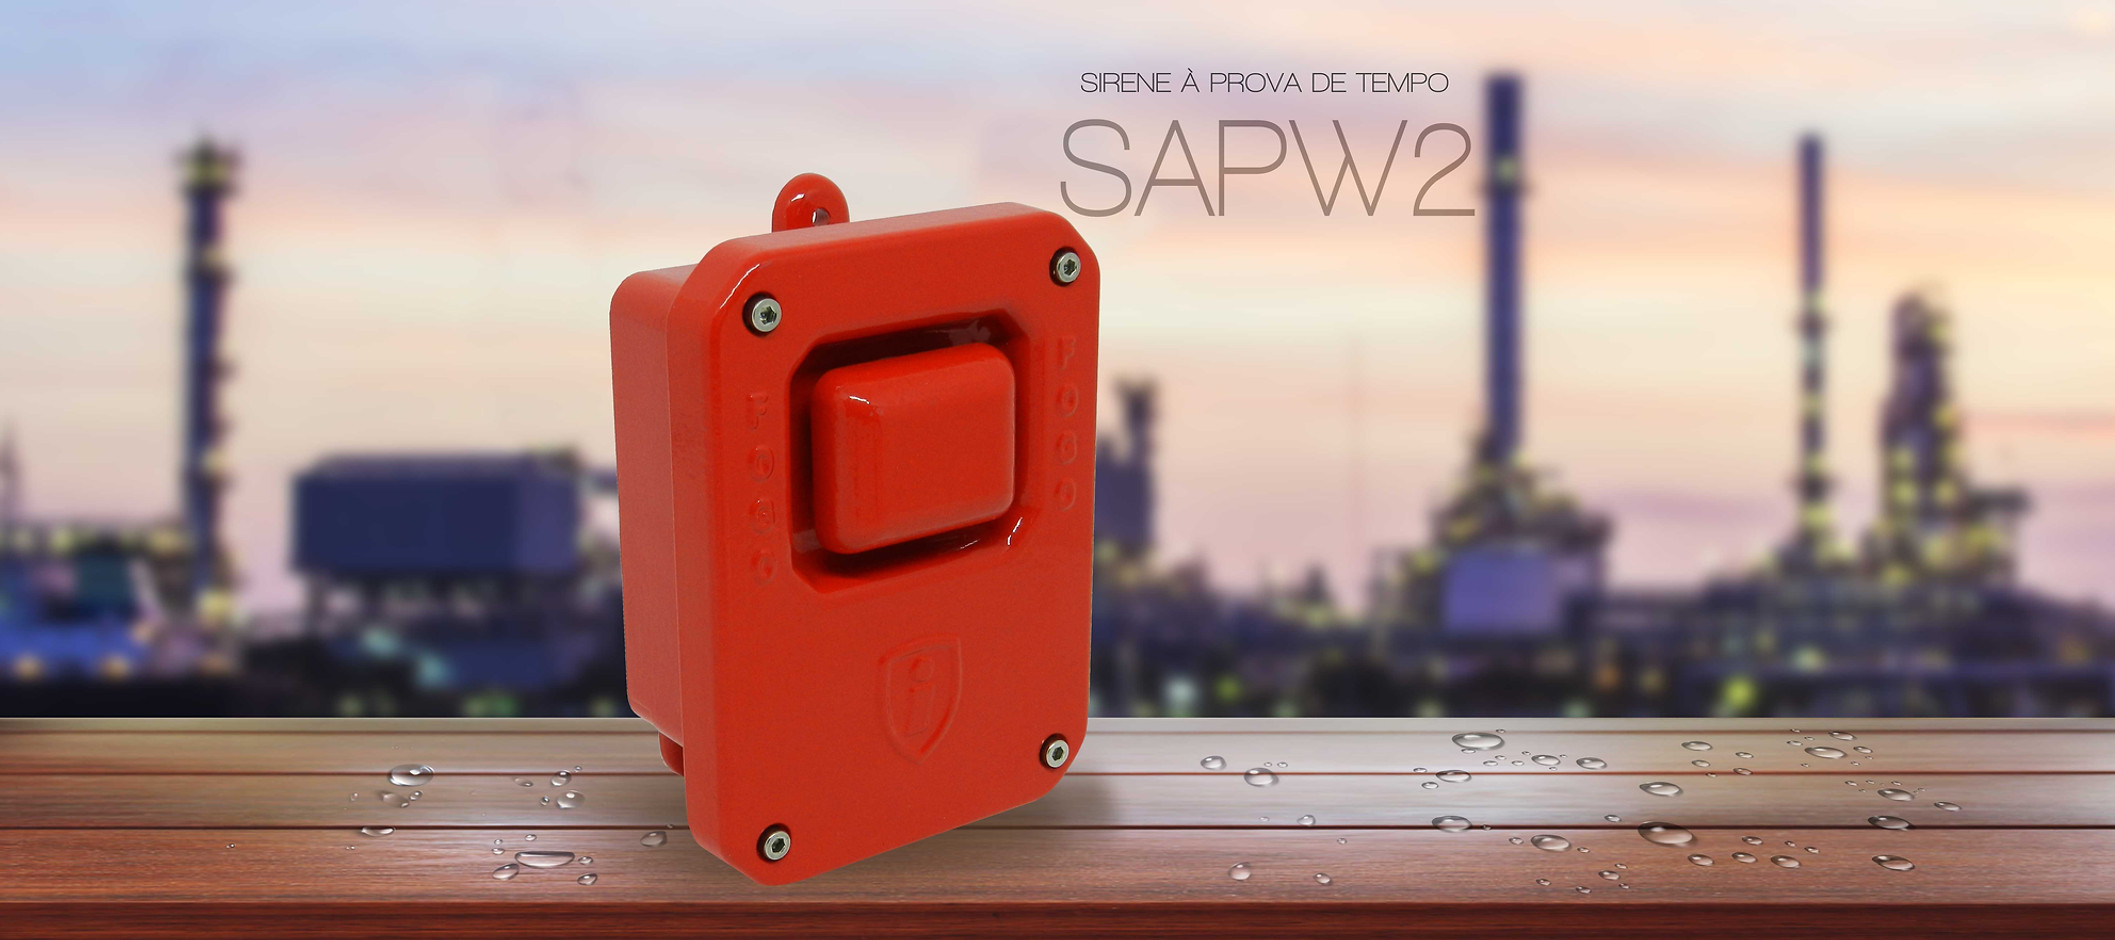 banner-sapw2.jpg